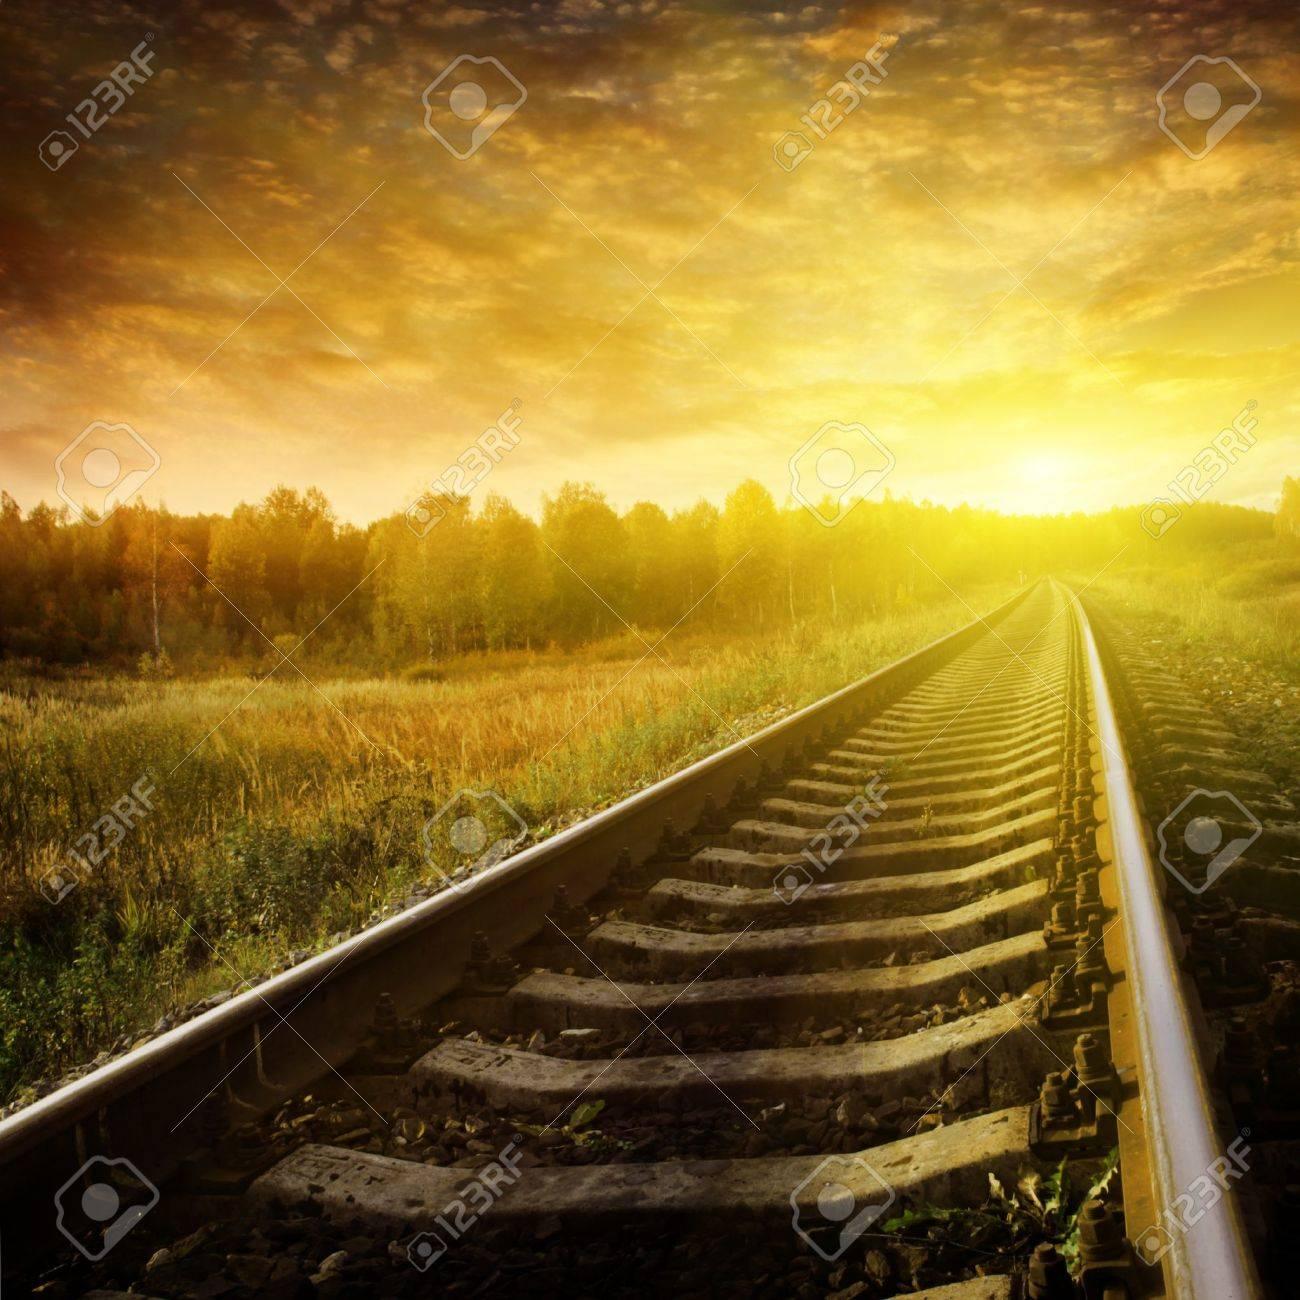 Railway at sunset. Stock Photo - 11646089